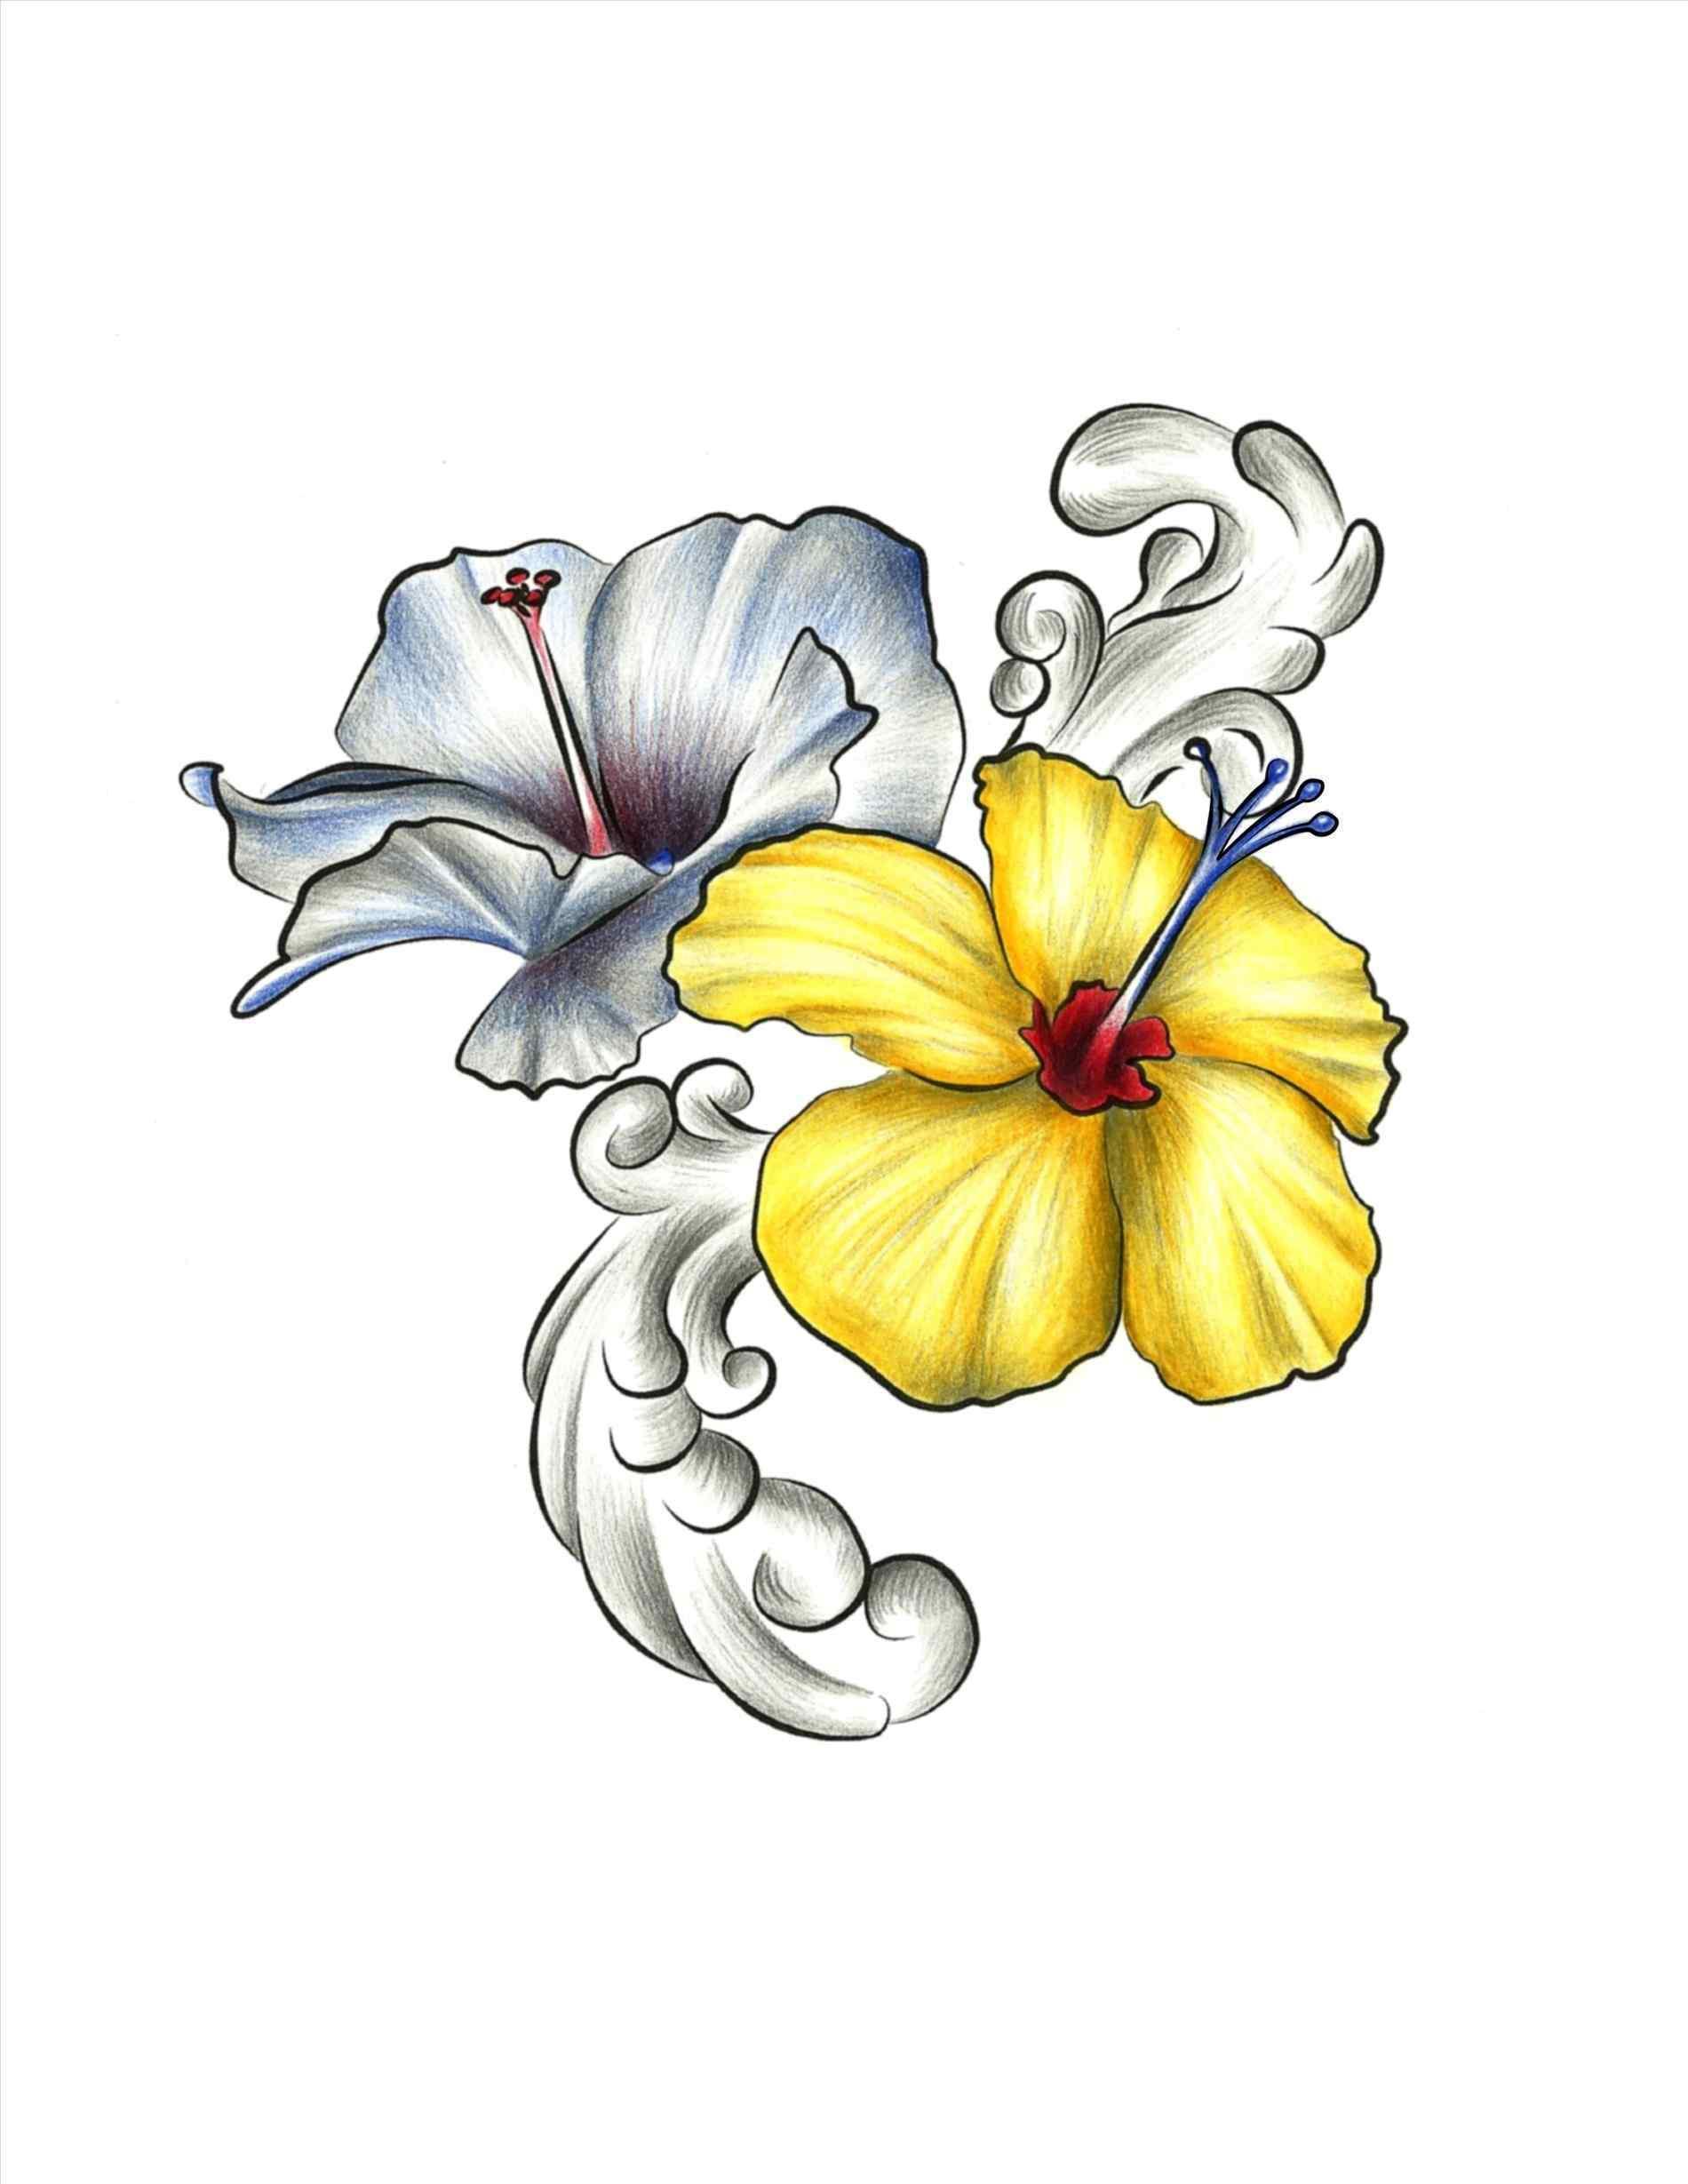 1900x2458 Drawings Of Hawaiian Flowers Your Meme Source